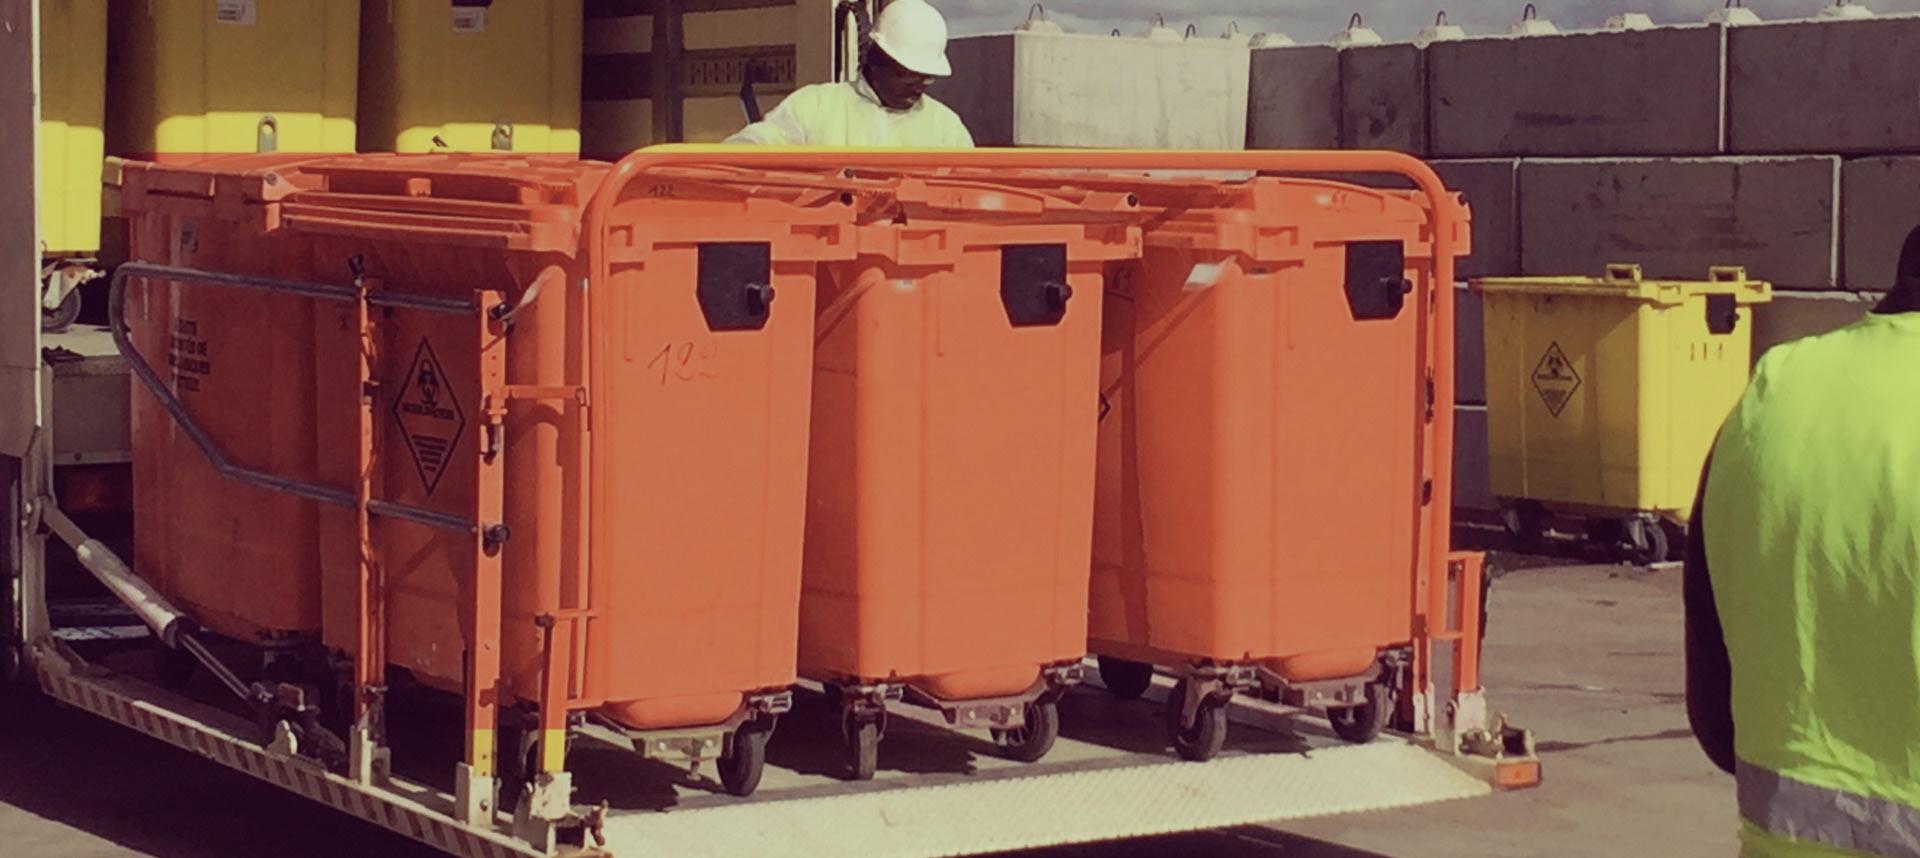 Elite Washroom Services: Clinical waste disposal bins